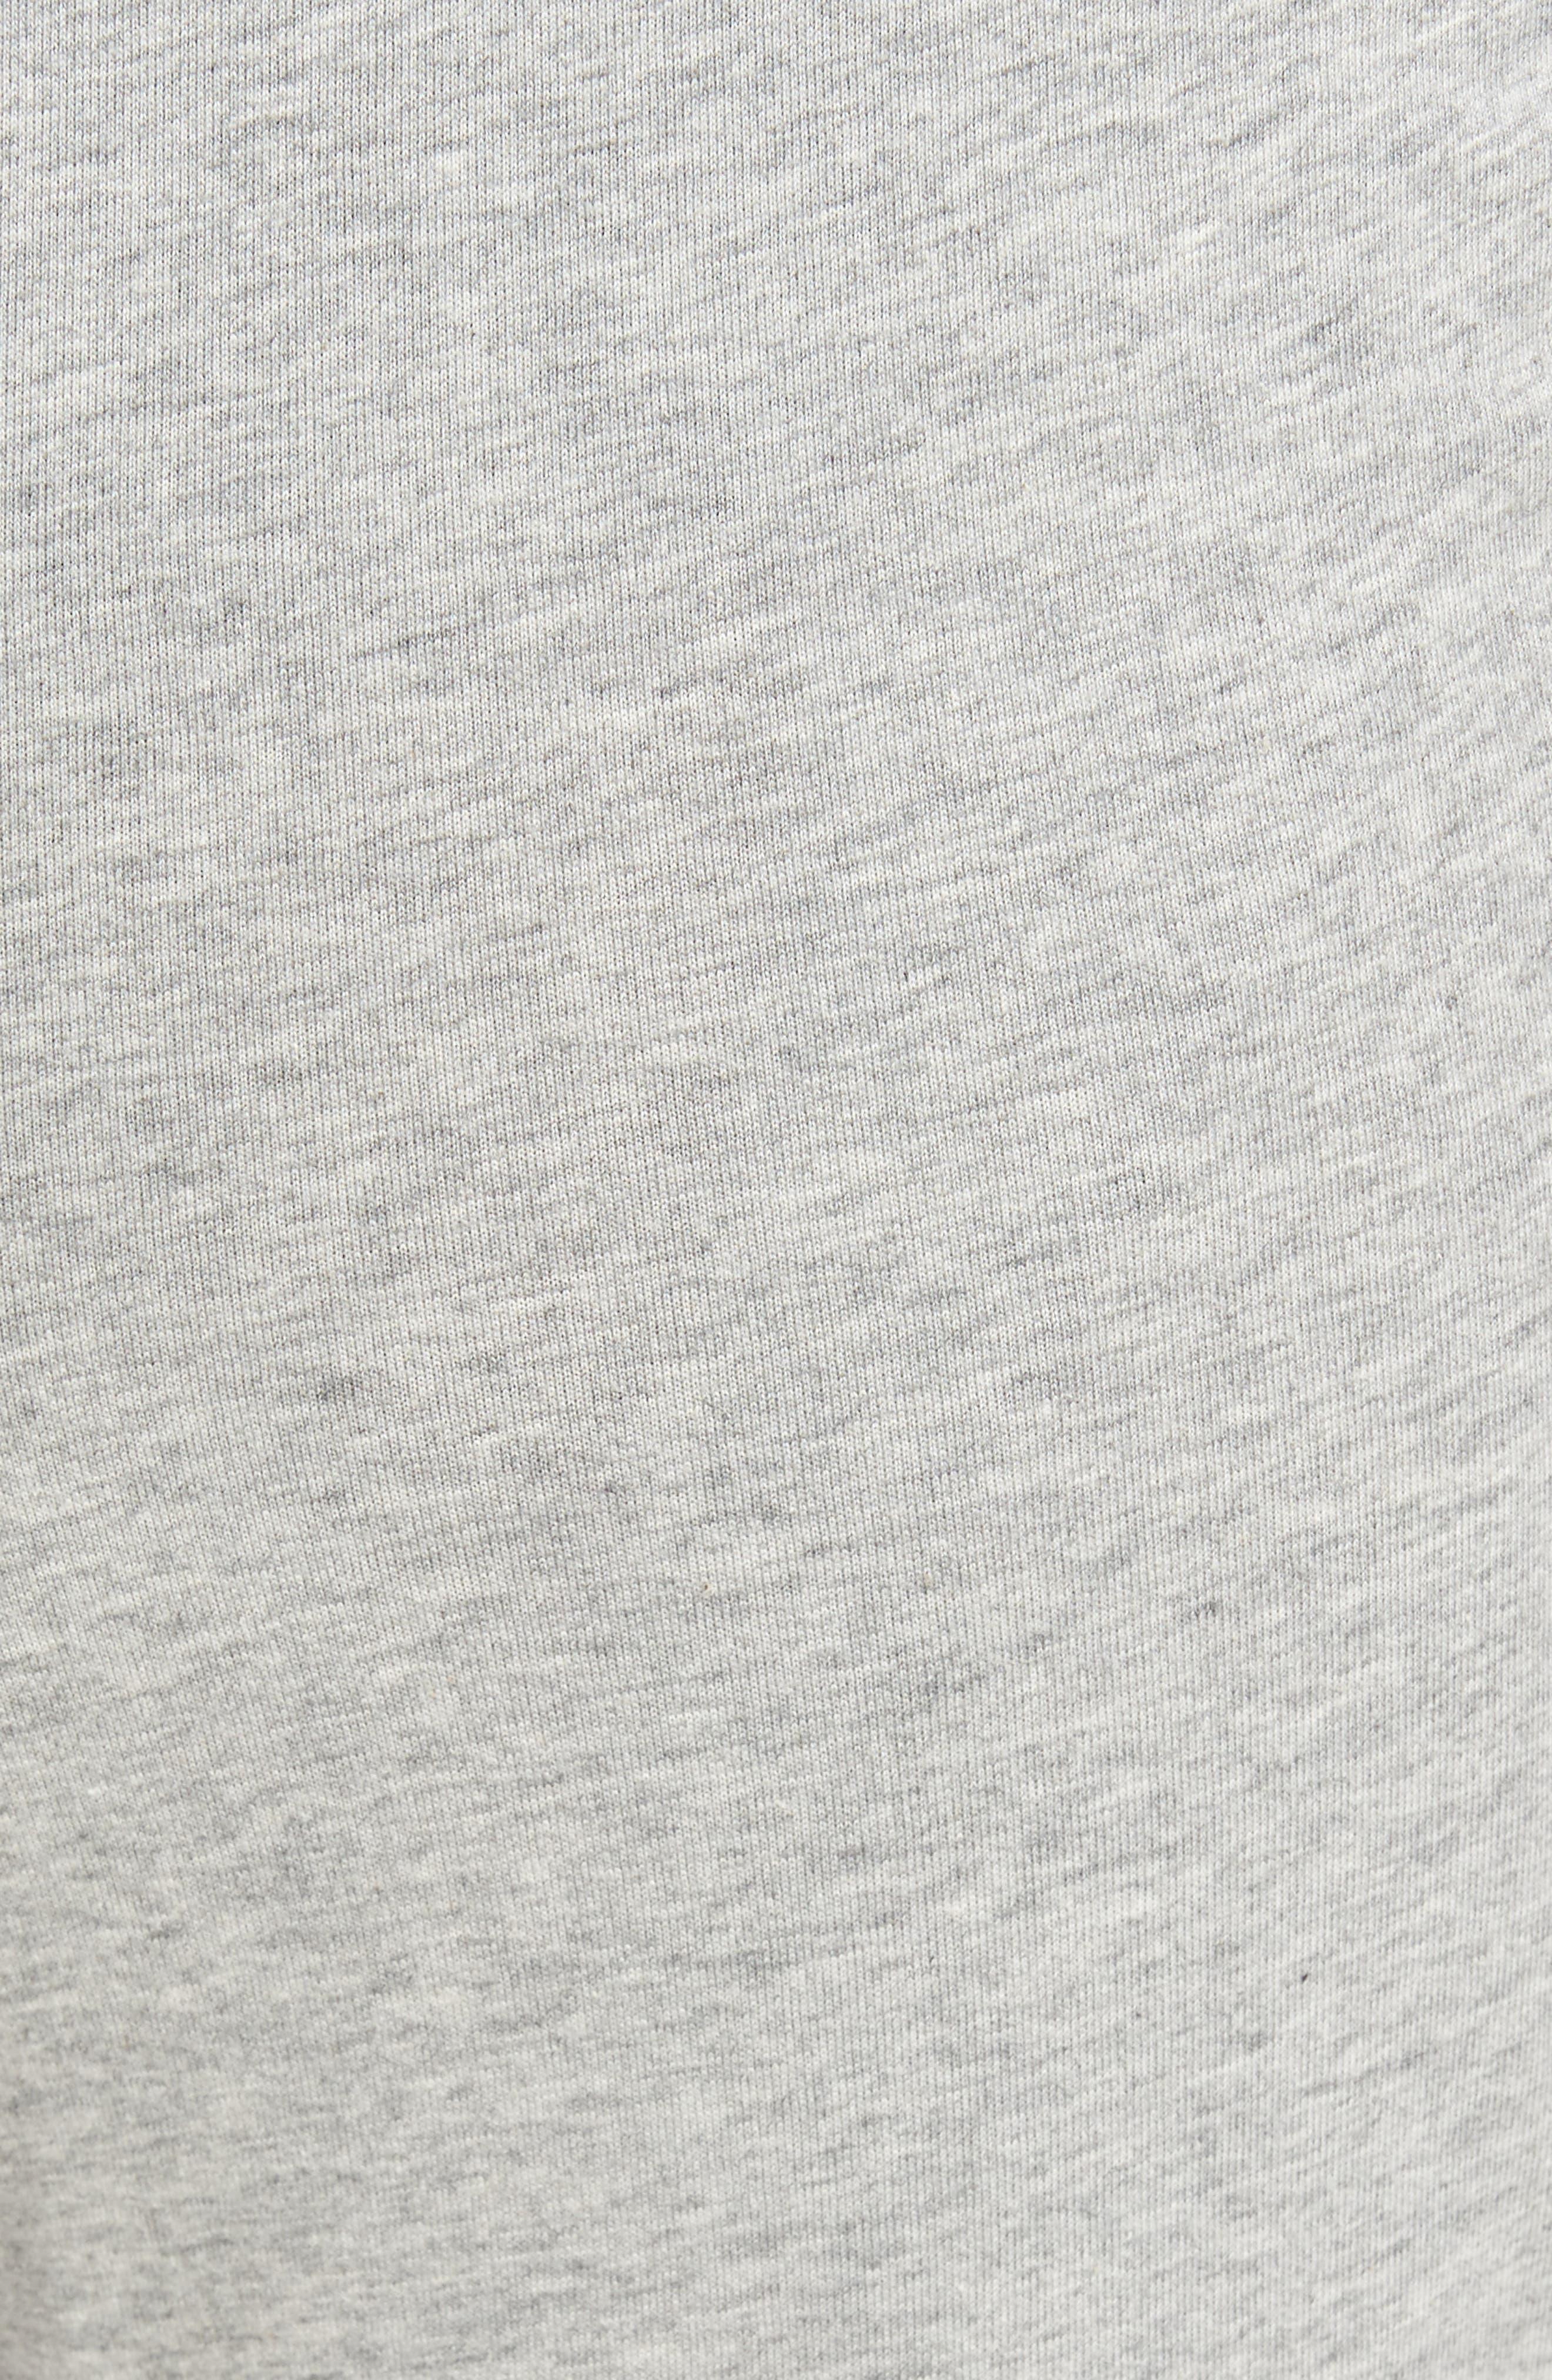 Cotton Jogger Lounge Pants,                             Alternate thumbnail 5, color,                             Andover Heather